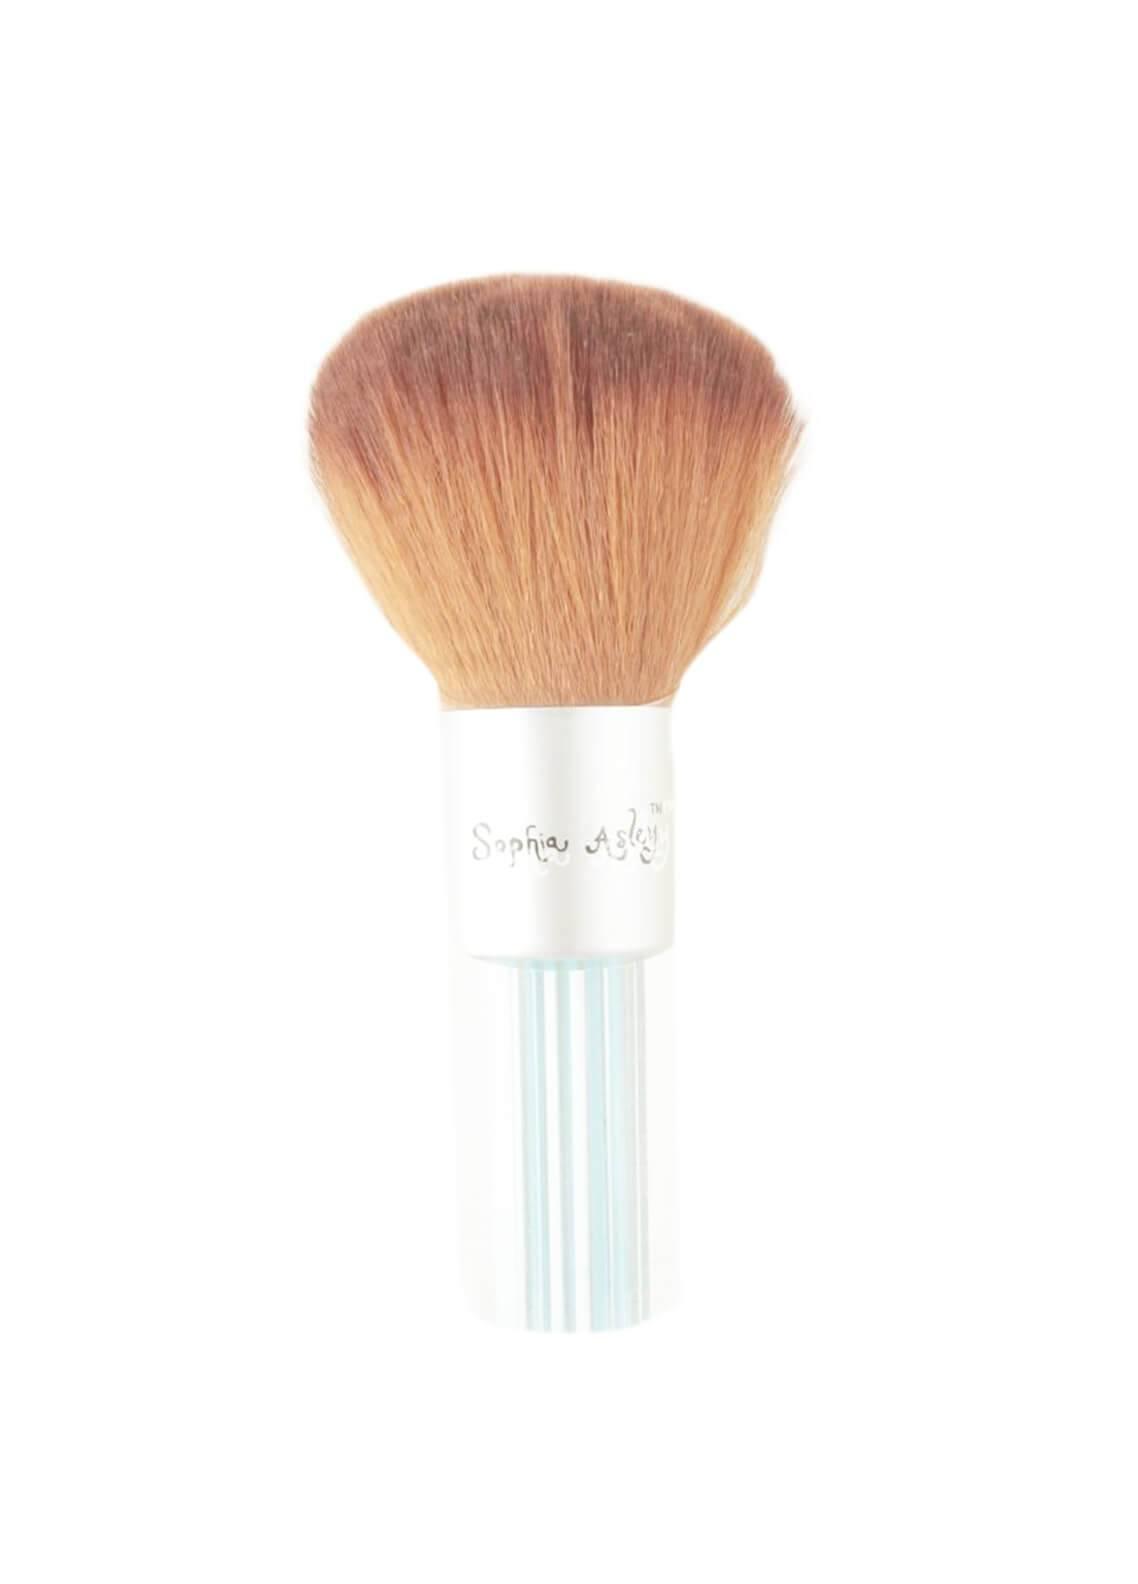 Sophia Asley Professional Kaboki Brush - Silver